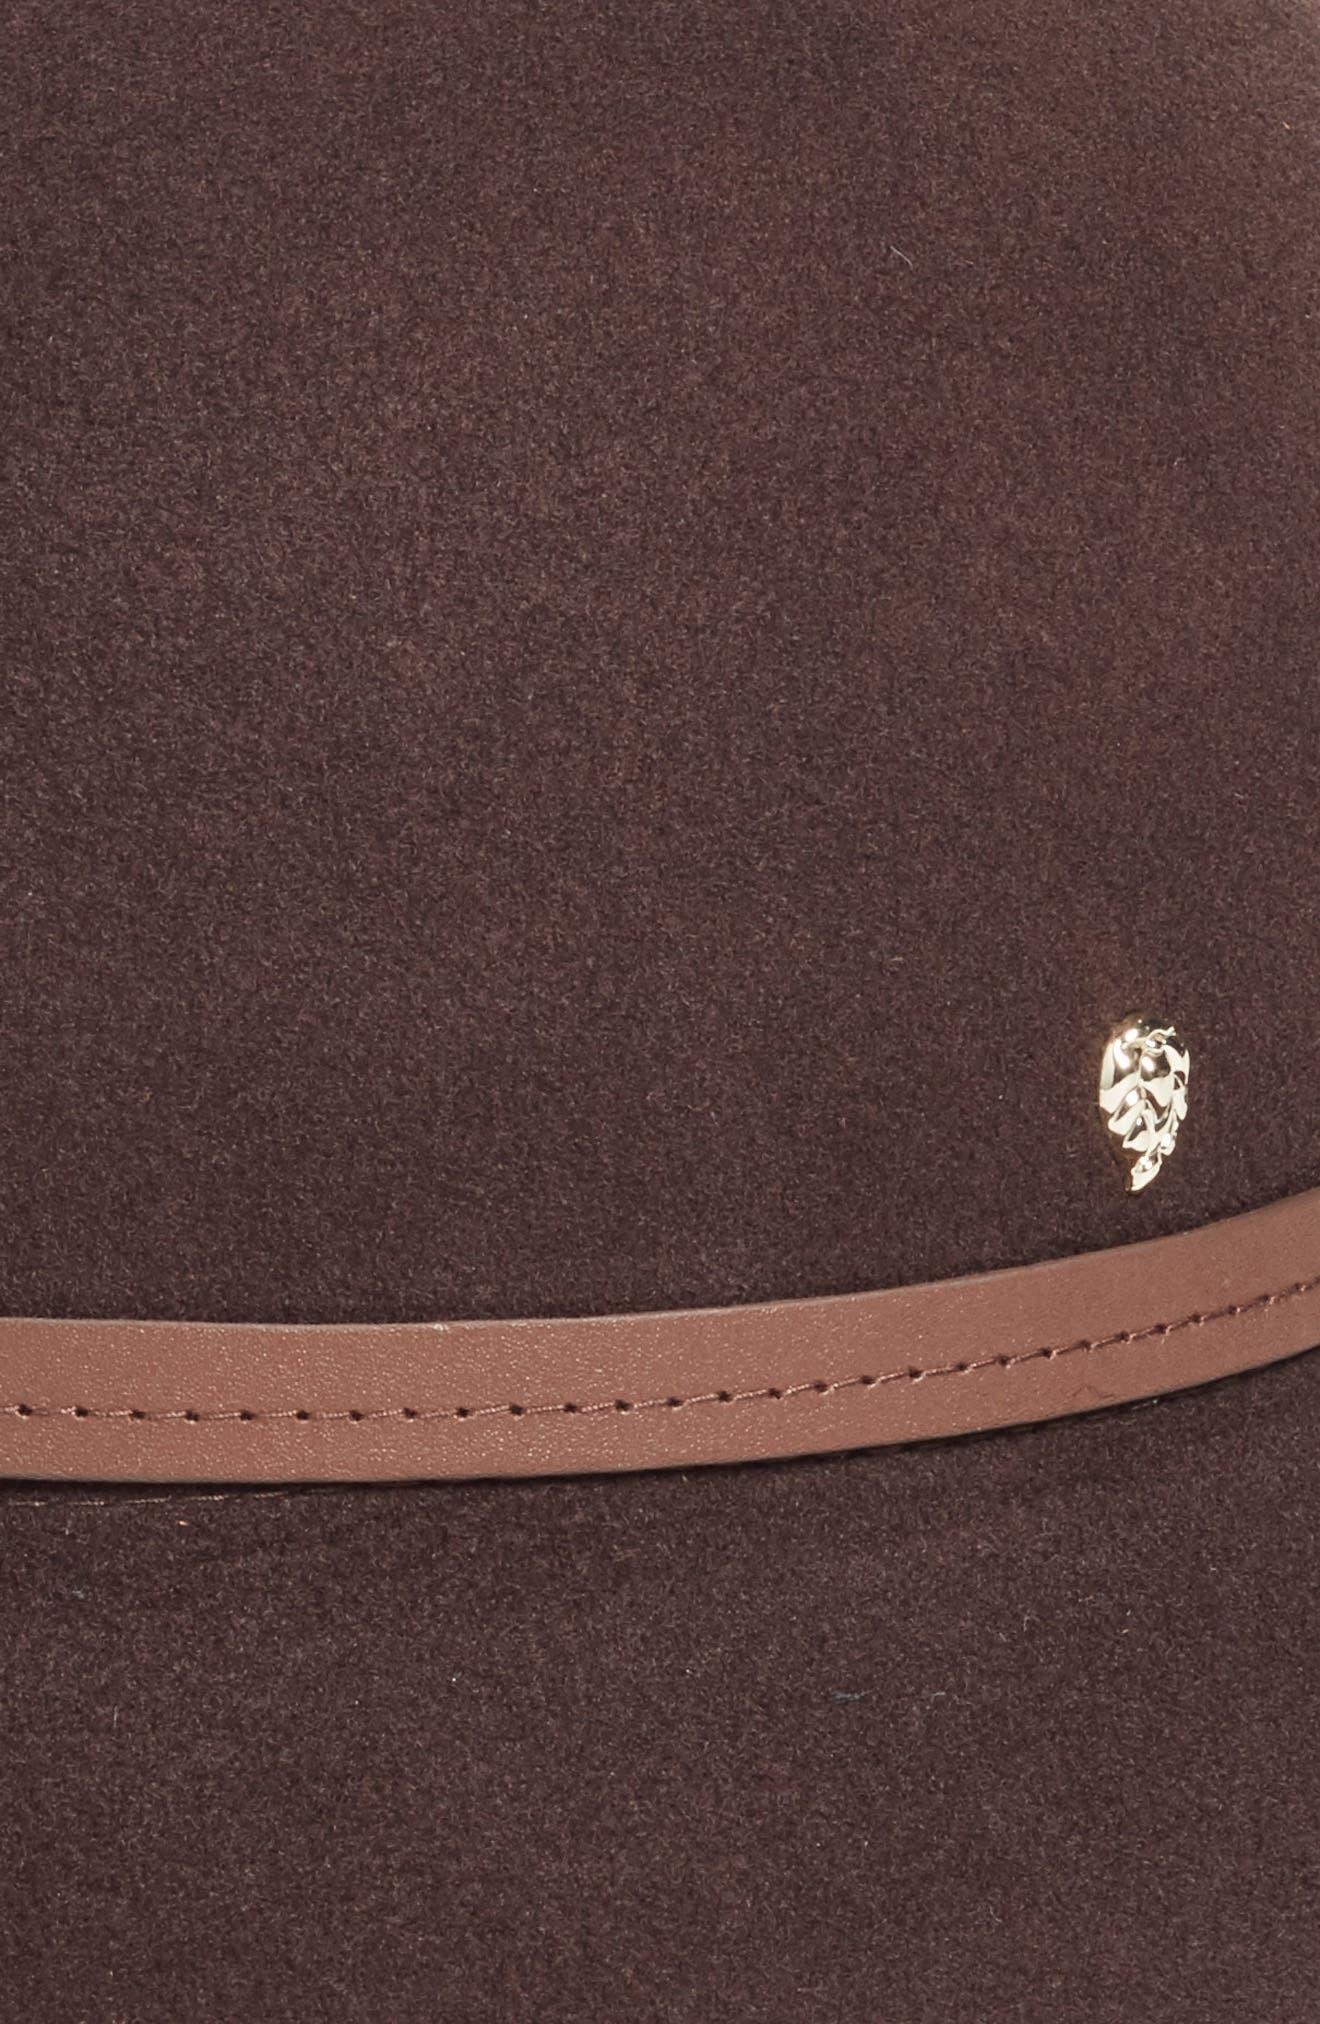 Angled Brim Wool Felt Hat,                             Alternate thumbnail 3, color,                             200